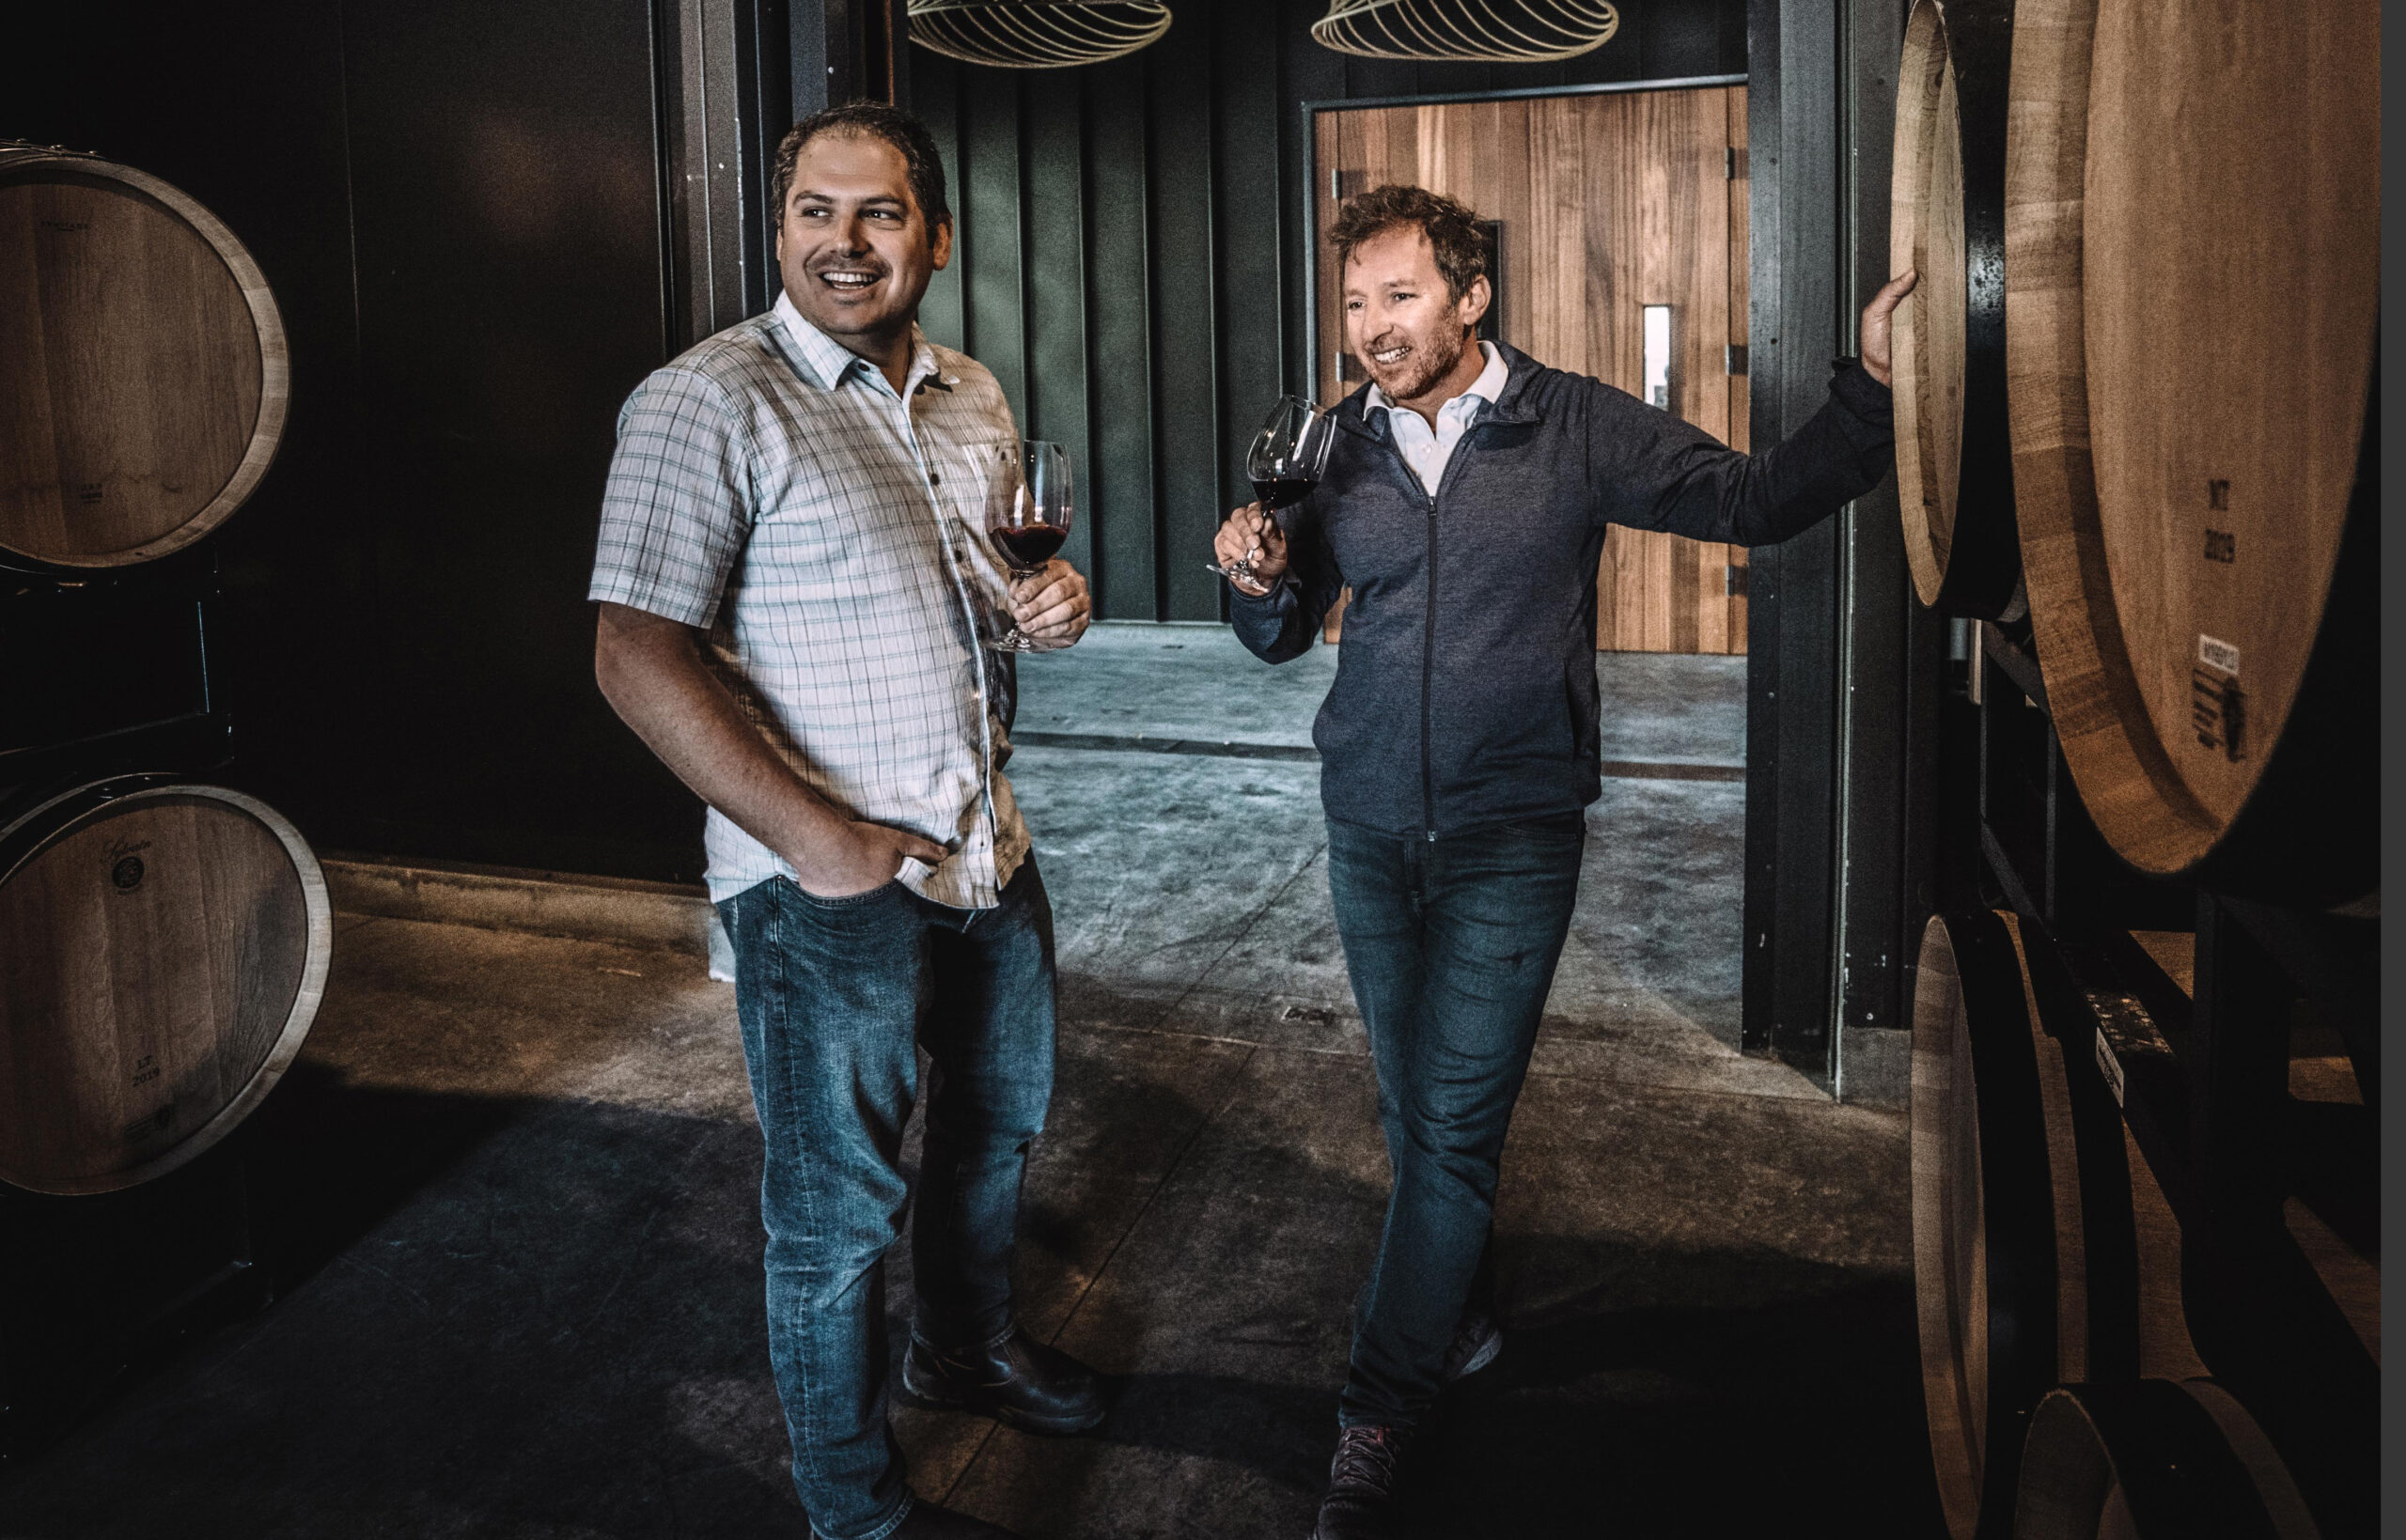 Winemakers Philippe Melka and Maayan Koschitzky